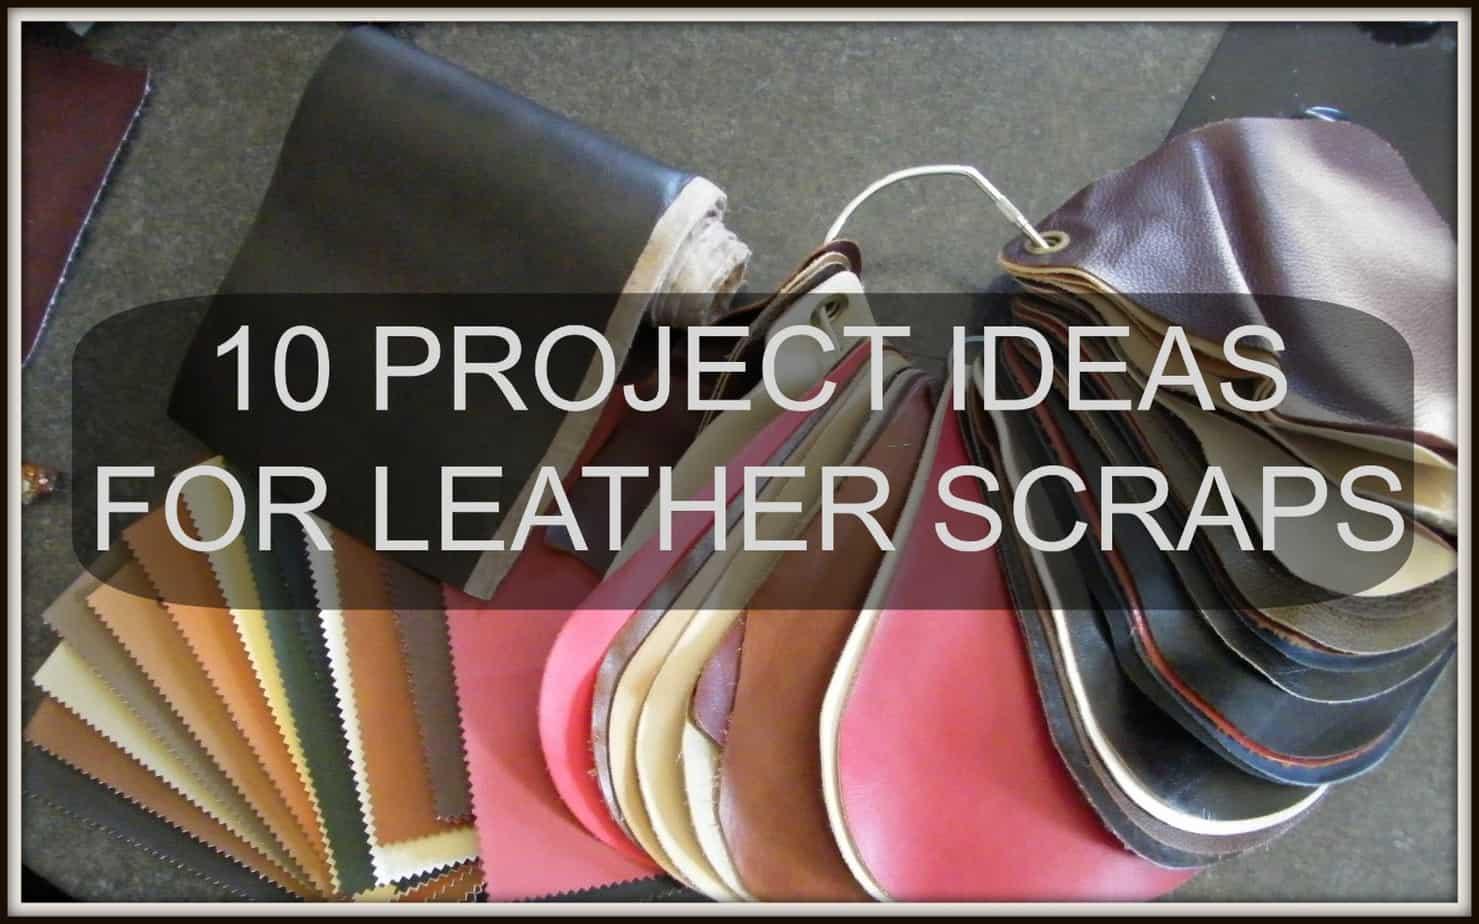 10 Project Ideas For Leather Scraps Fynes Designs Fynes Designs